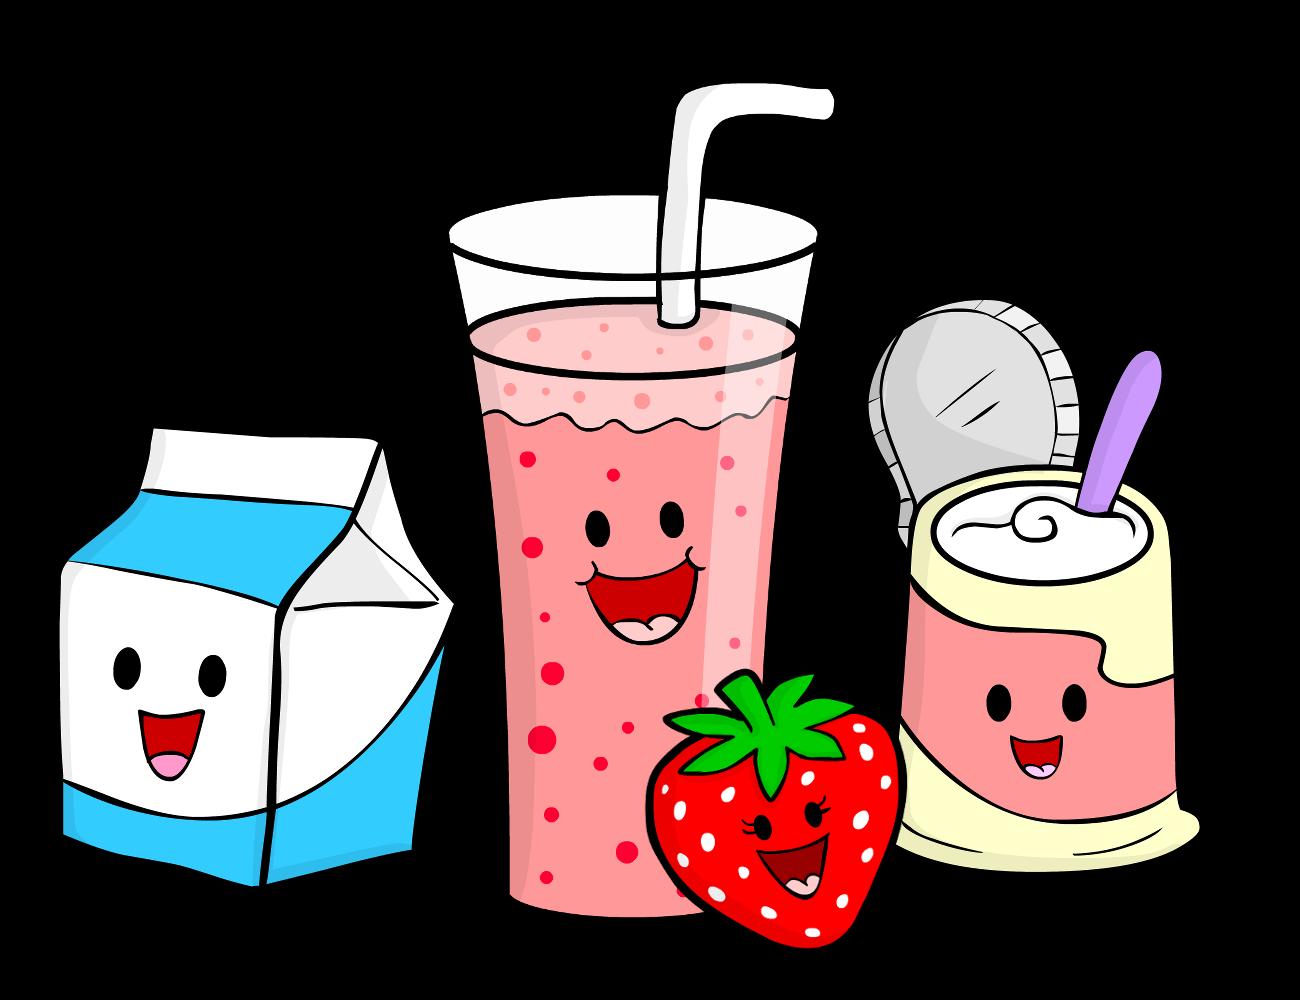 Clip Art Healthy Food Coloring Clipart - Clipart Kid